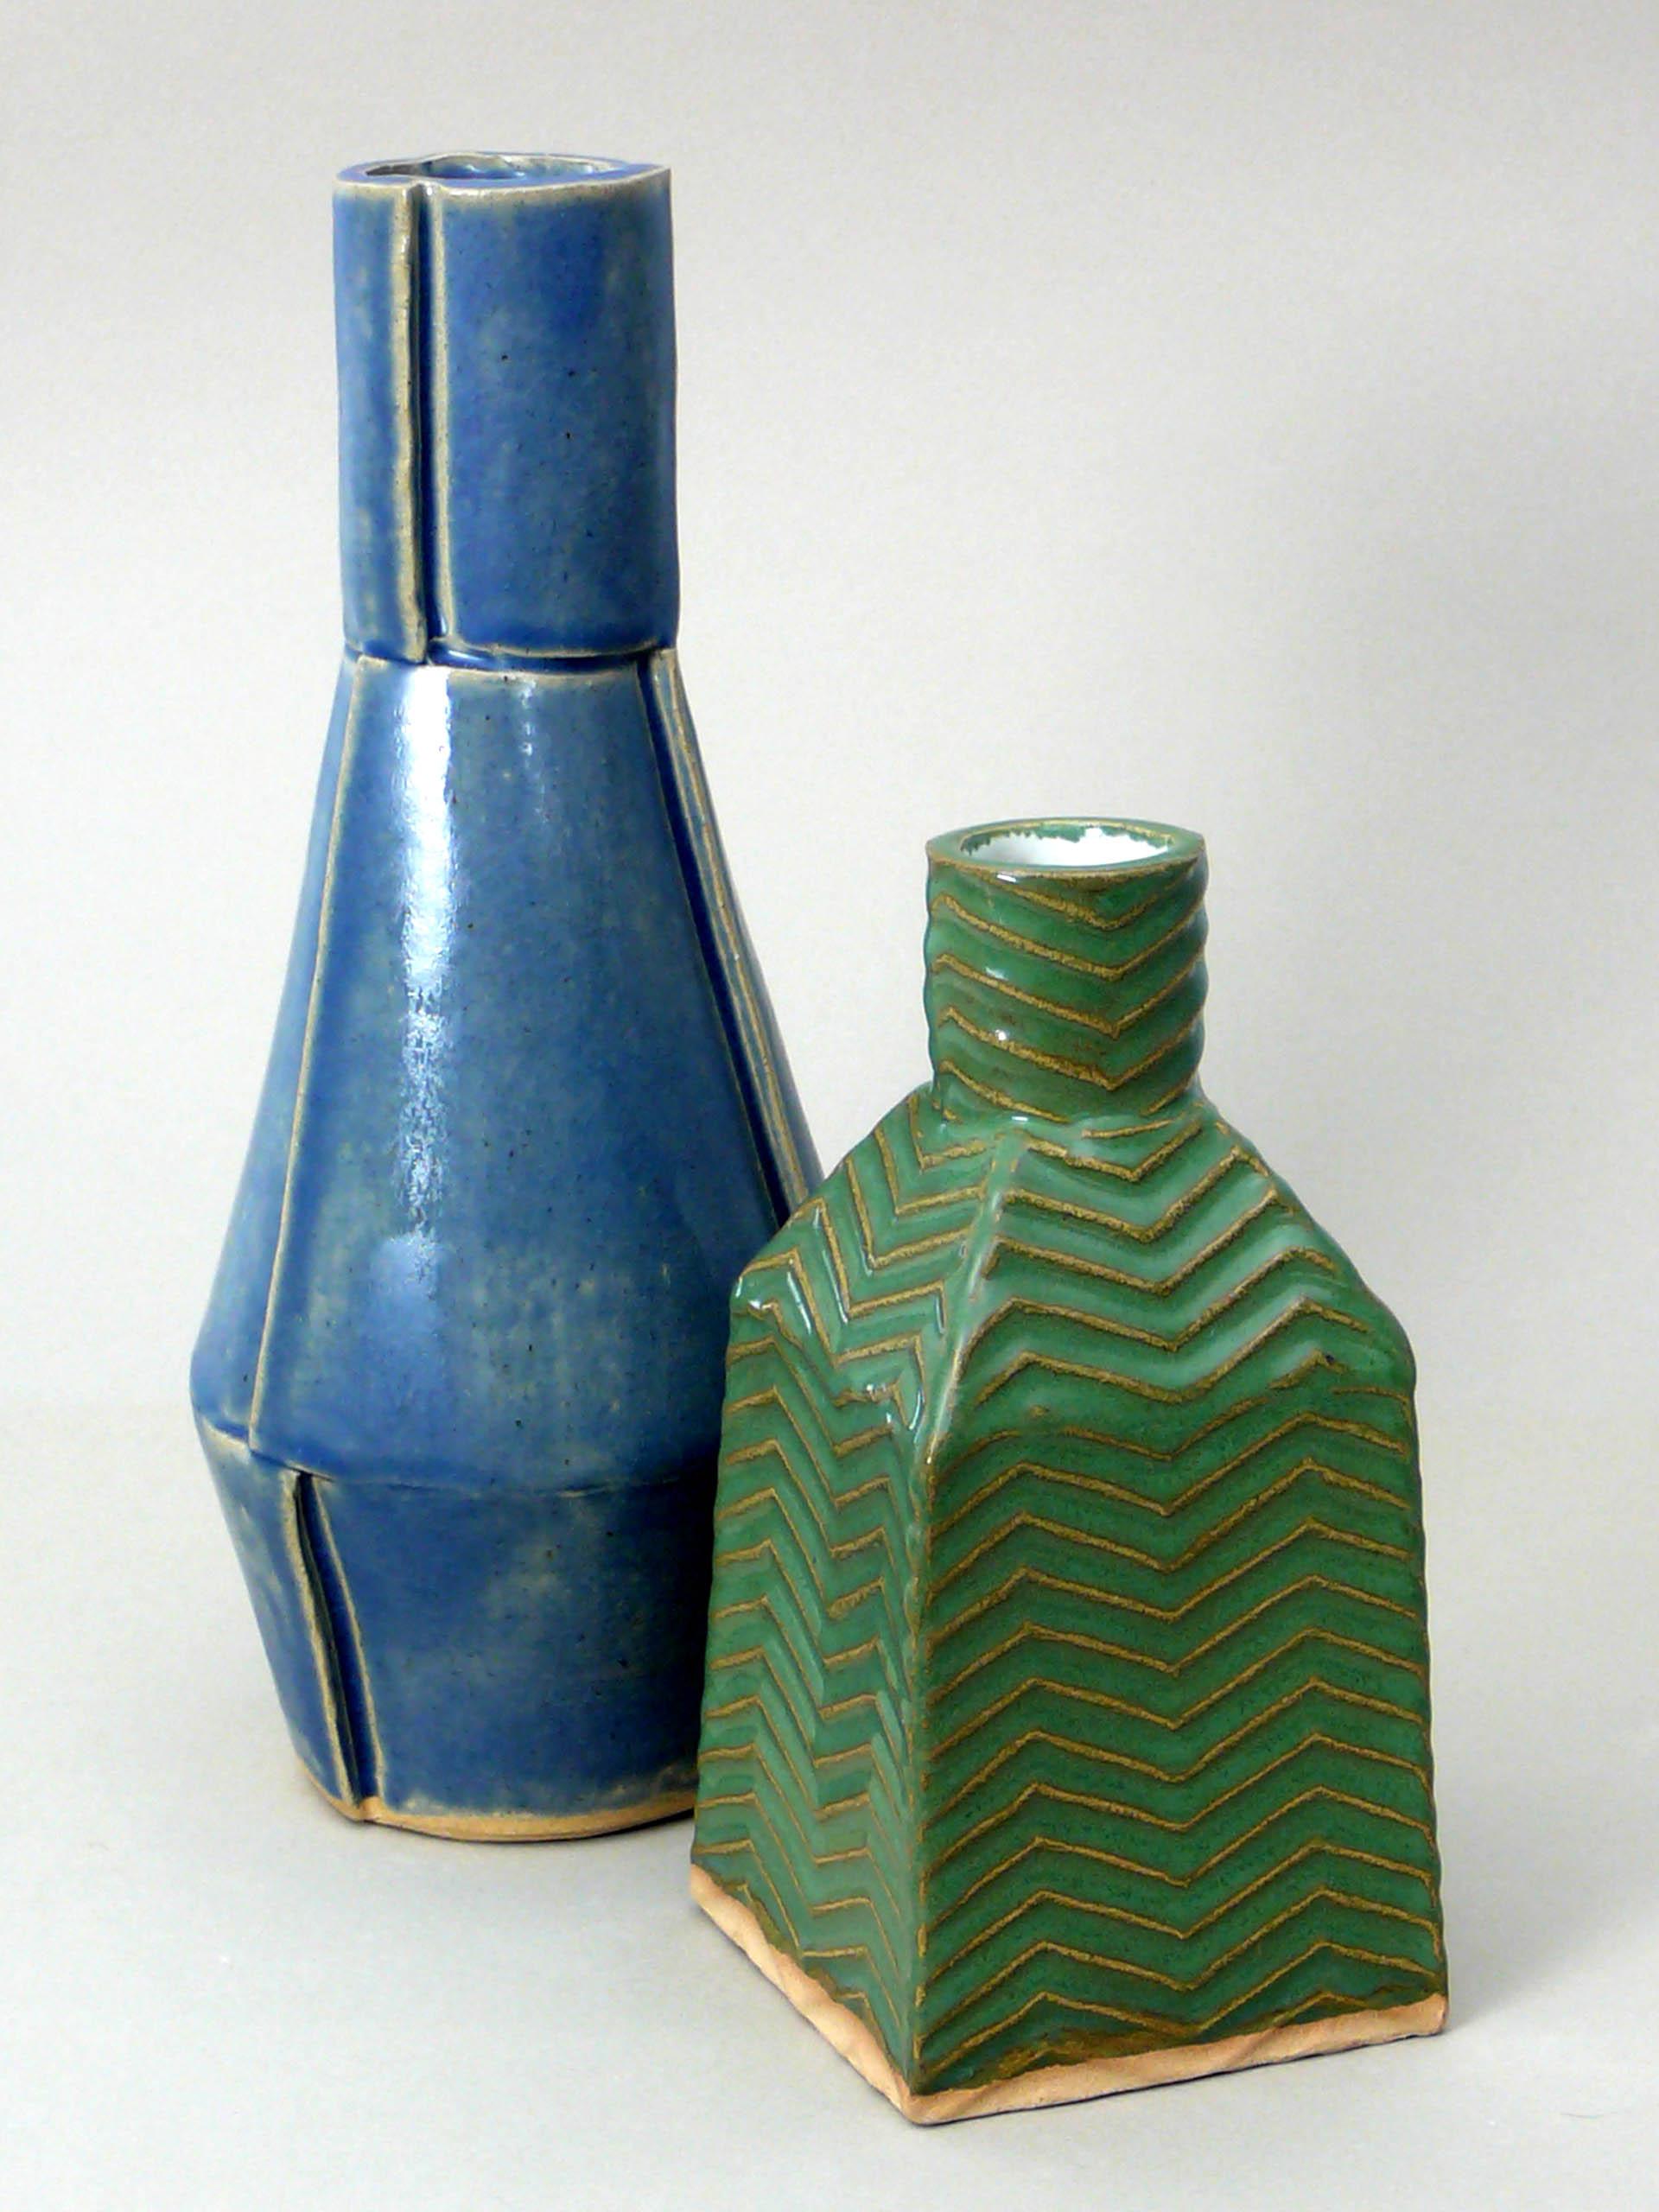 Panel Vase and Square Vase